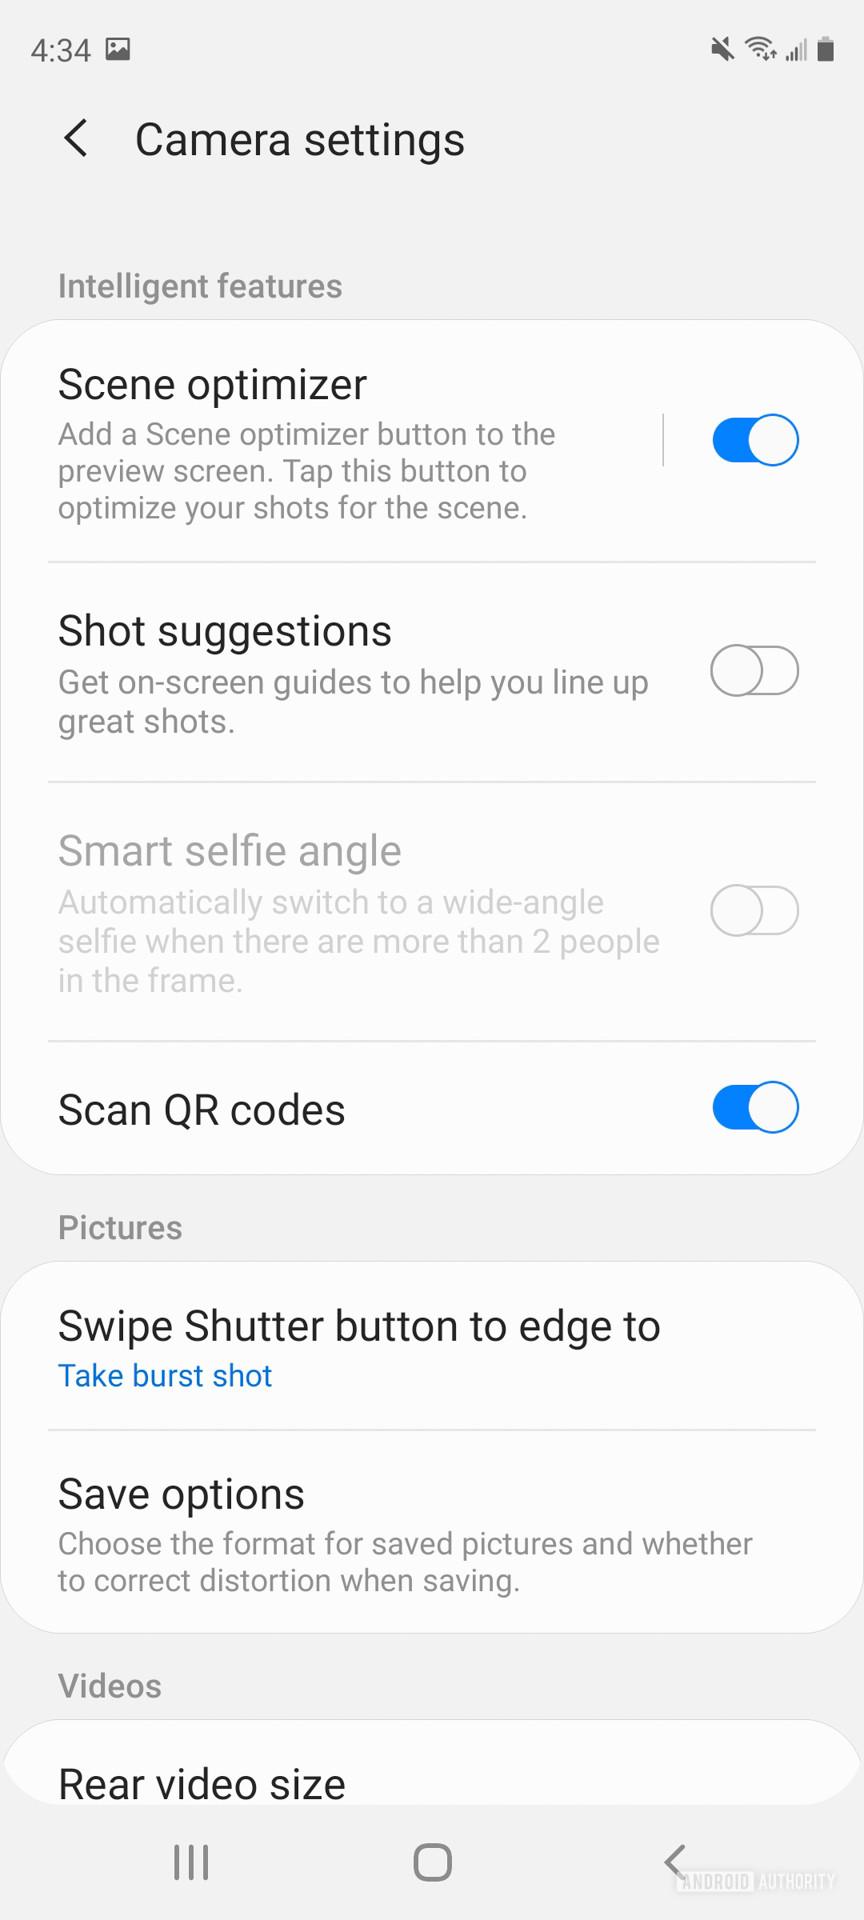 Samsung Galaxy S20 FE camera settings